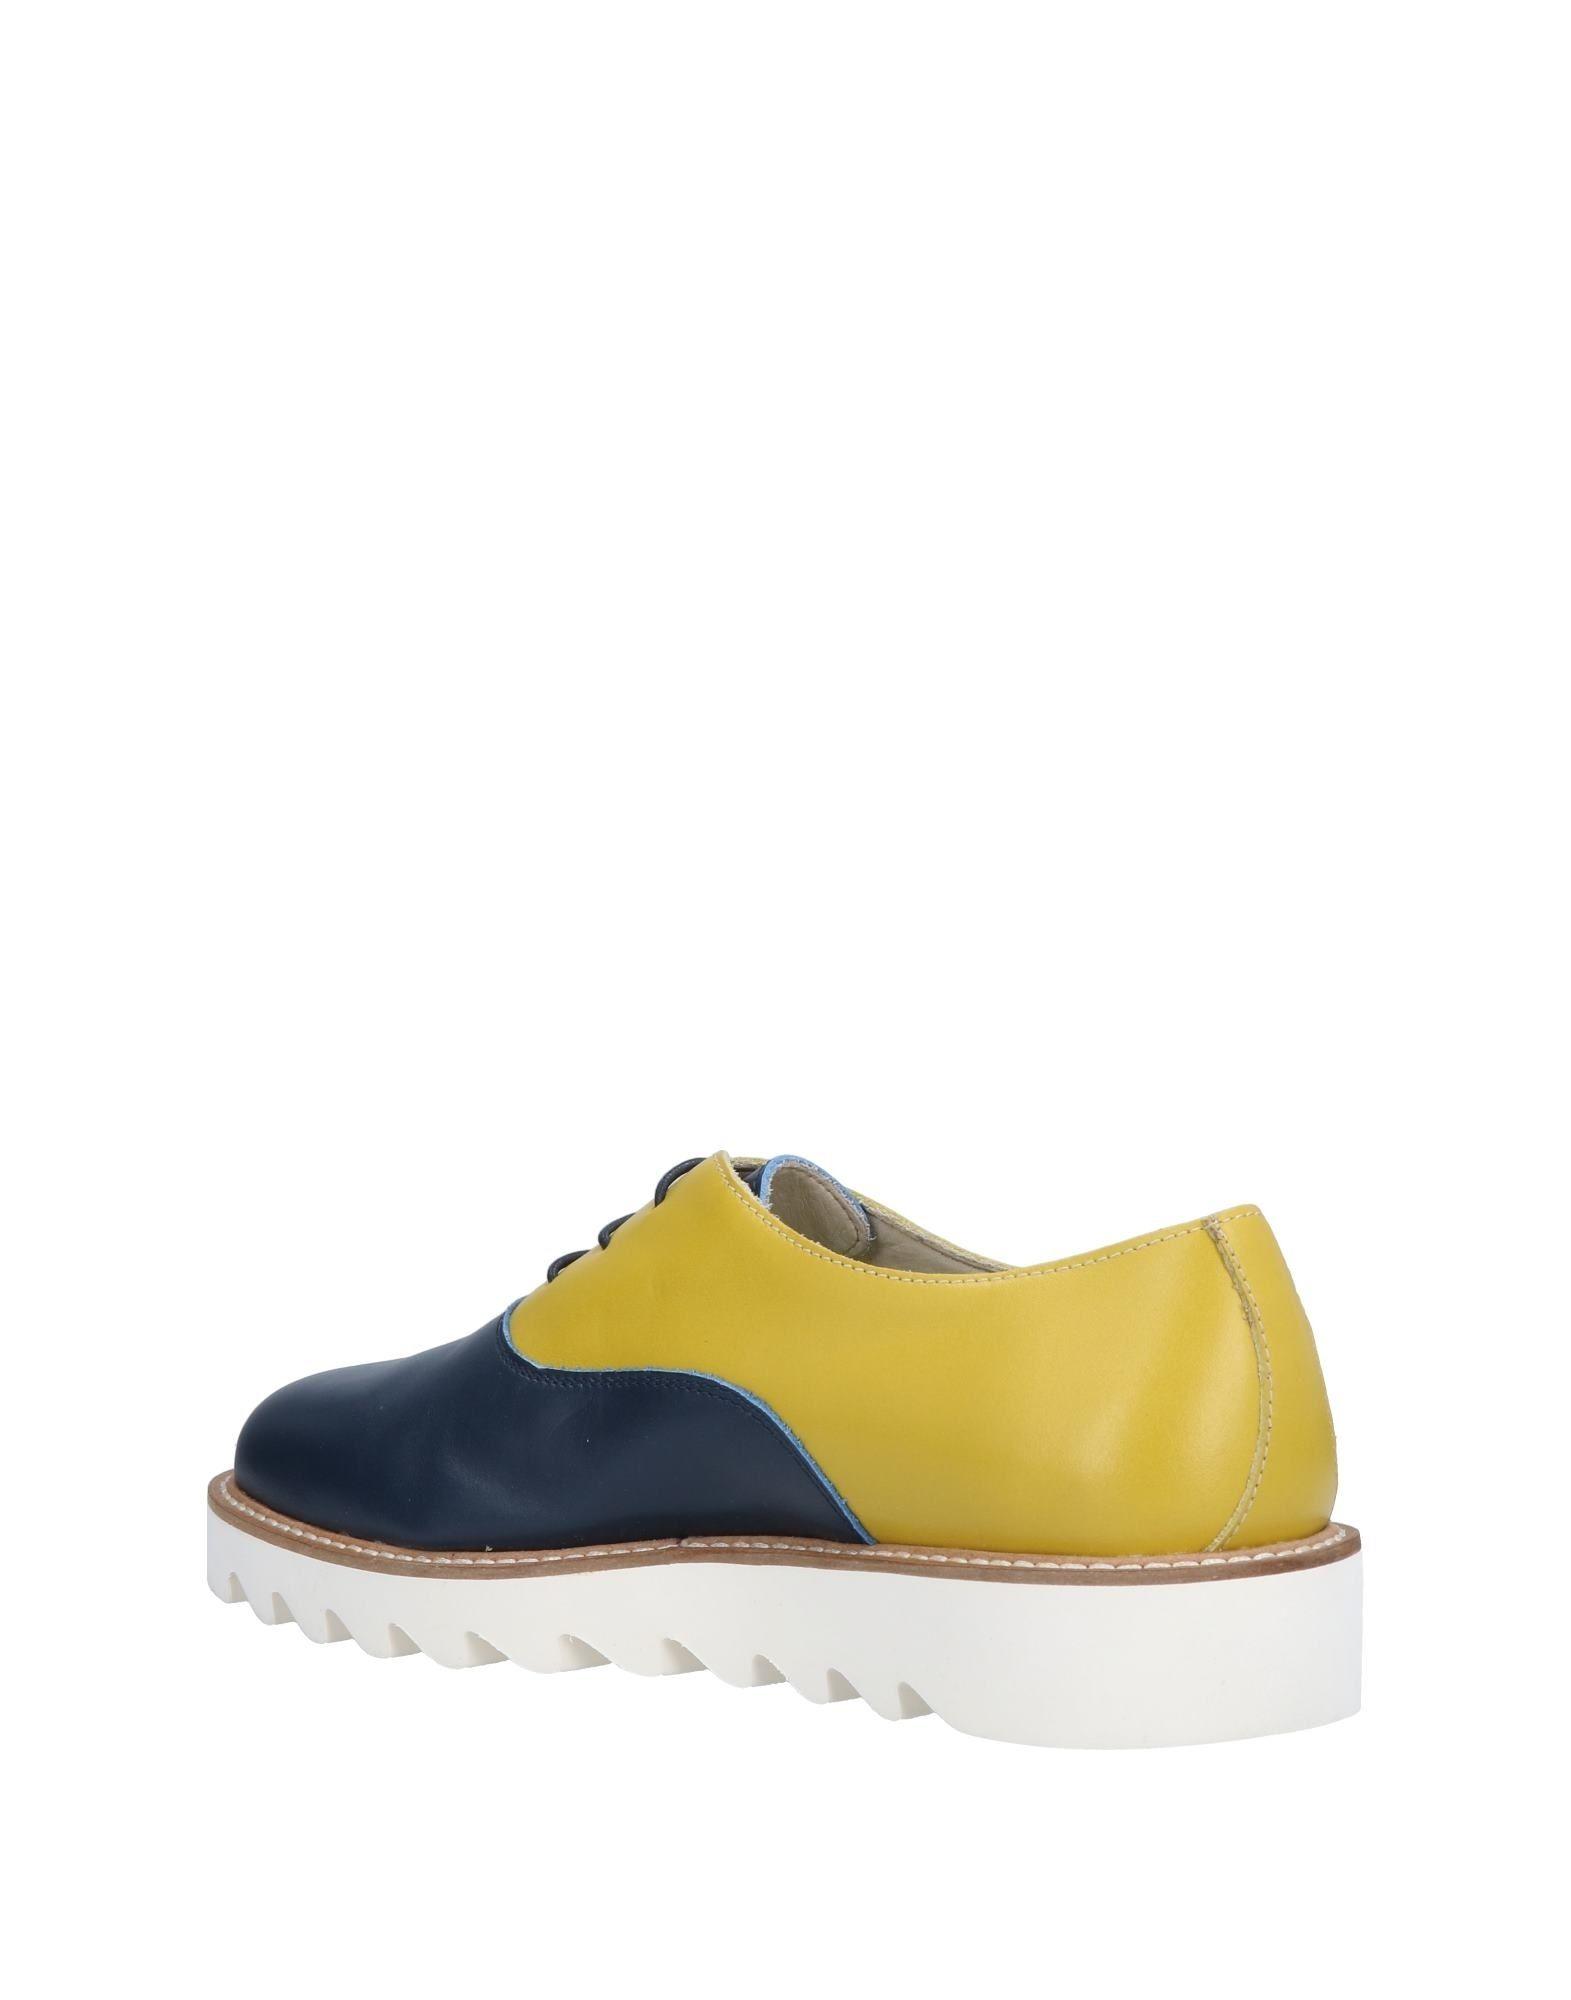 Rabatt Schuhe echte Schuhe Rabatt ( Verba ) Schnürschuhe Herren  11487579LS 2c8799